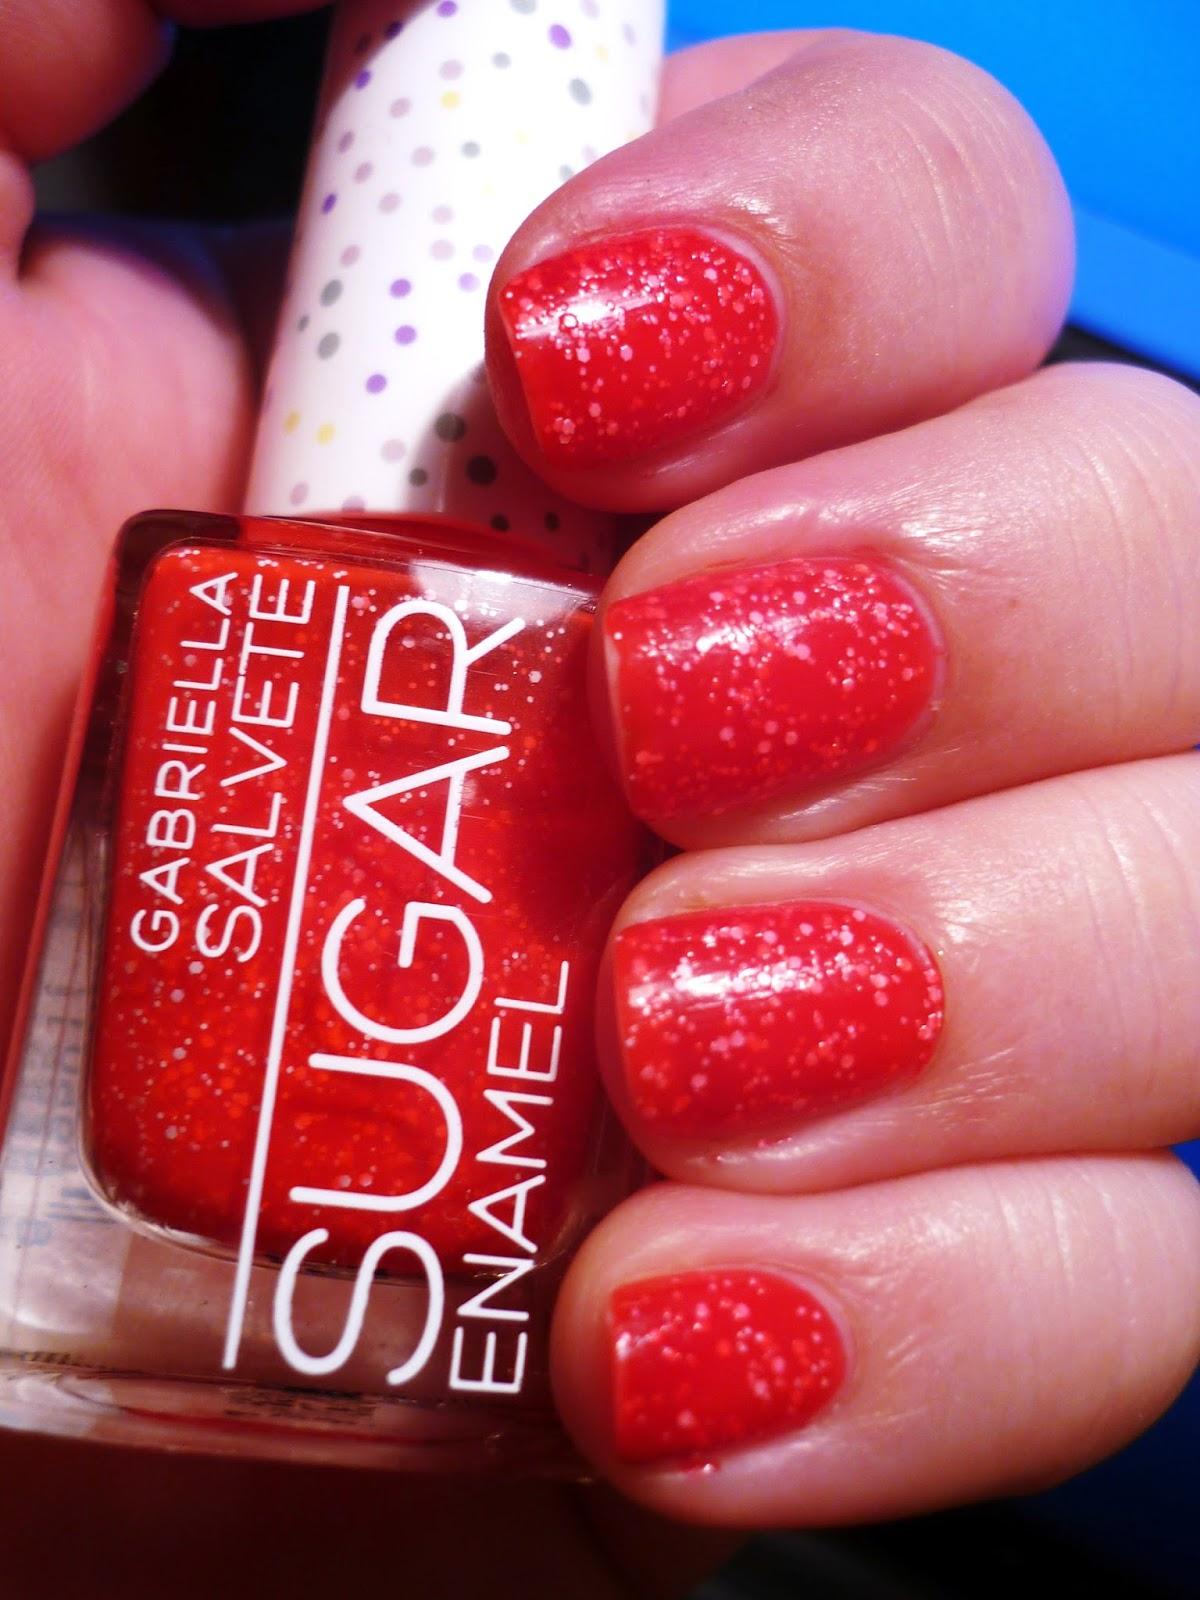 Lsg Blog Recenze Lak Na Nehty Sugar Od Gabriella Salvete Odstin 04 Passione